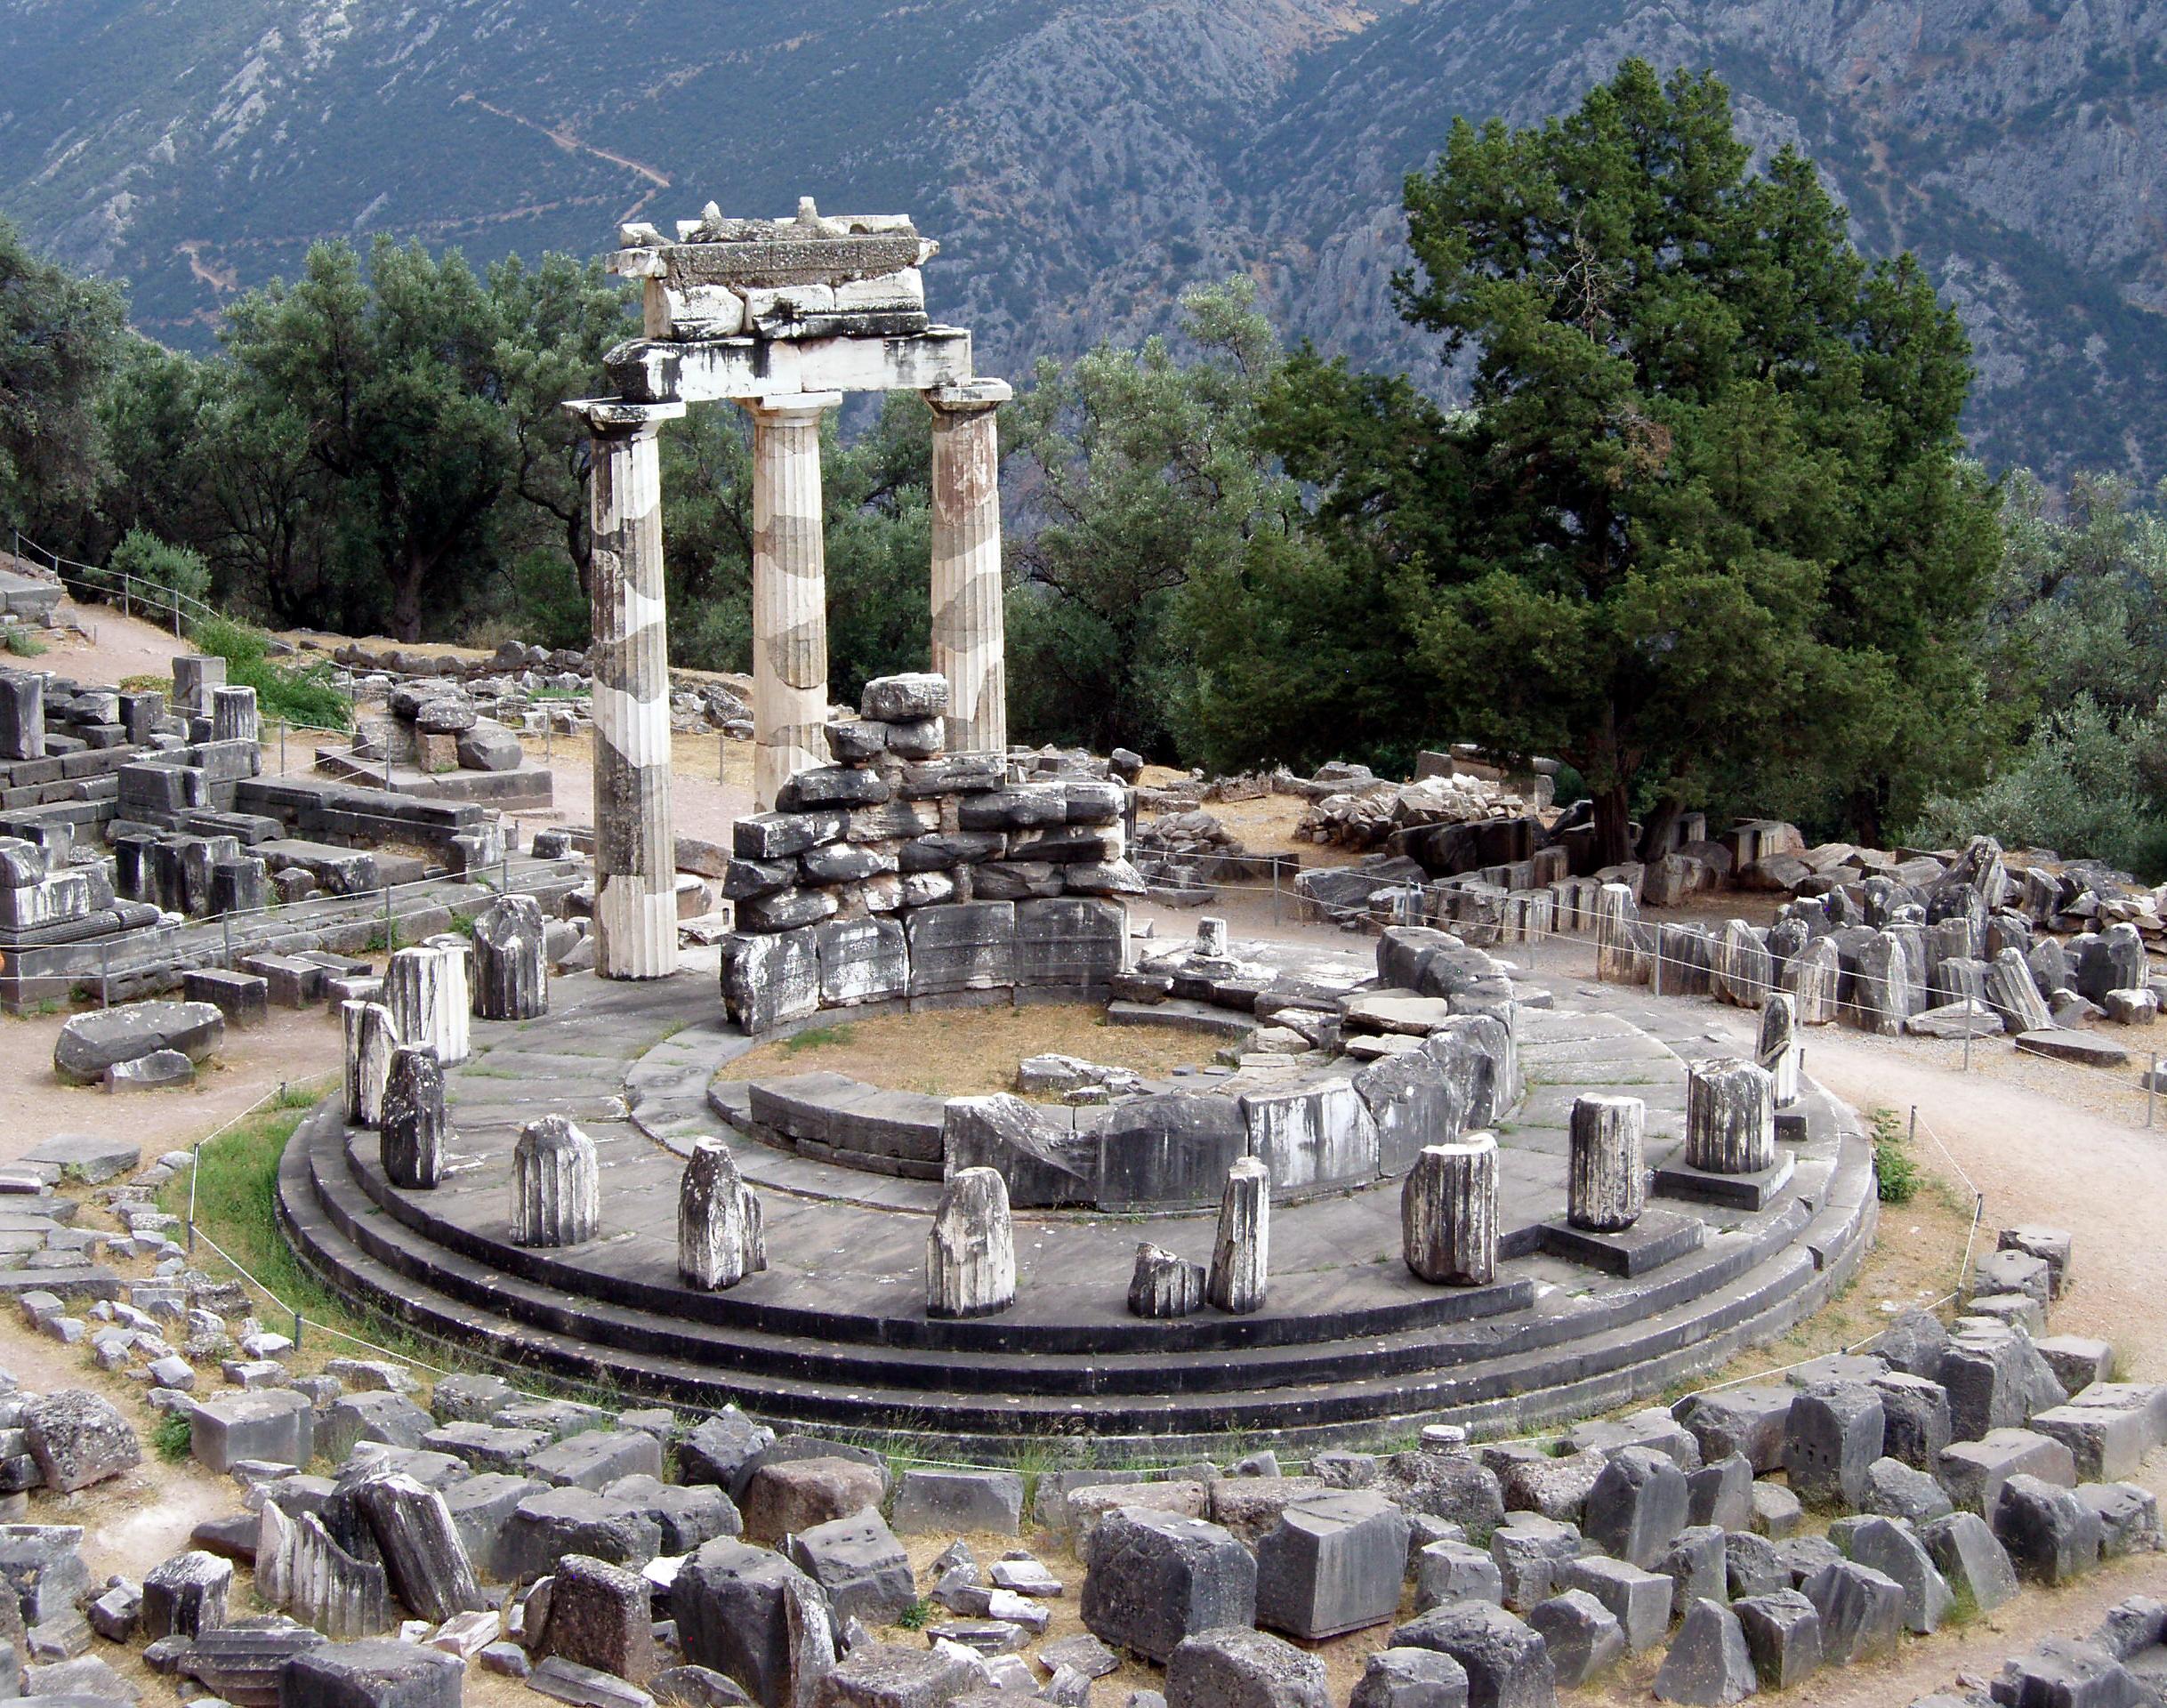 delphi_iloveathenstours_holiday_vacation_enjoy_bookataxi_bookavan_bookamionibus_arahova_greece_luxurytaxi_vip_transport_transfer_airportathens..jpeg